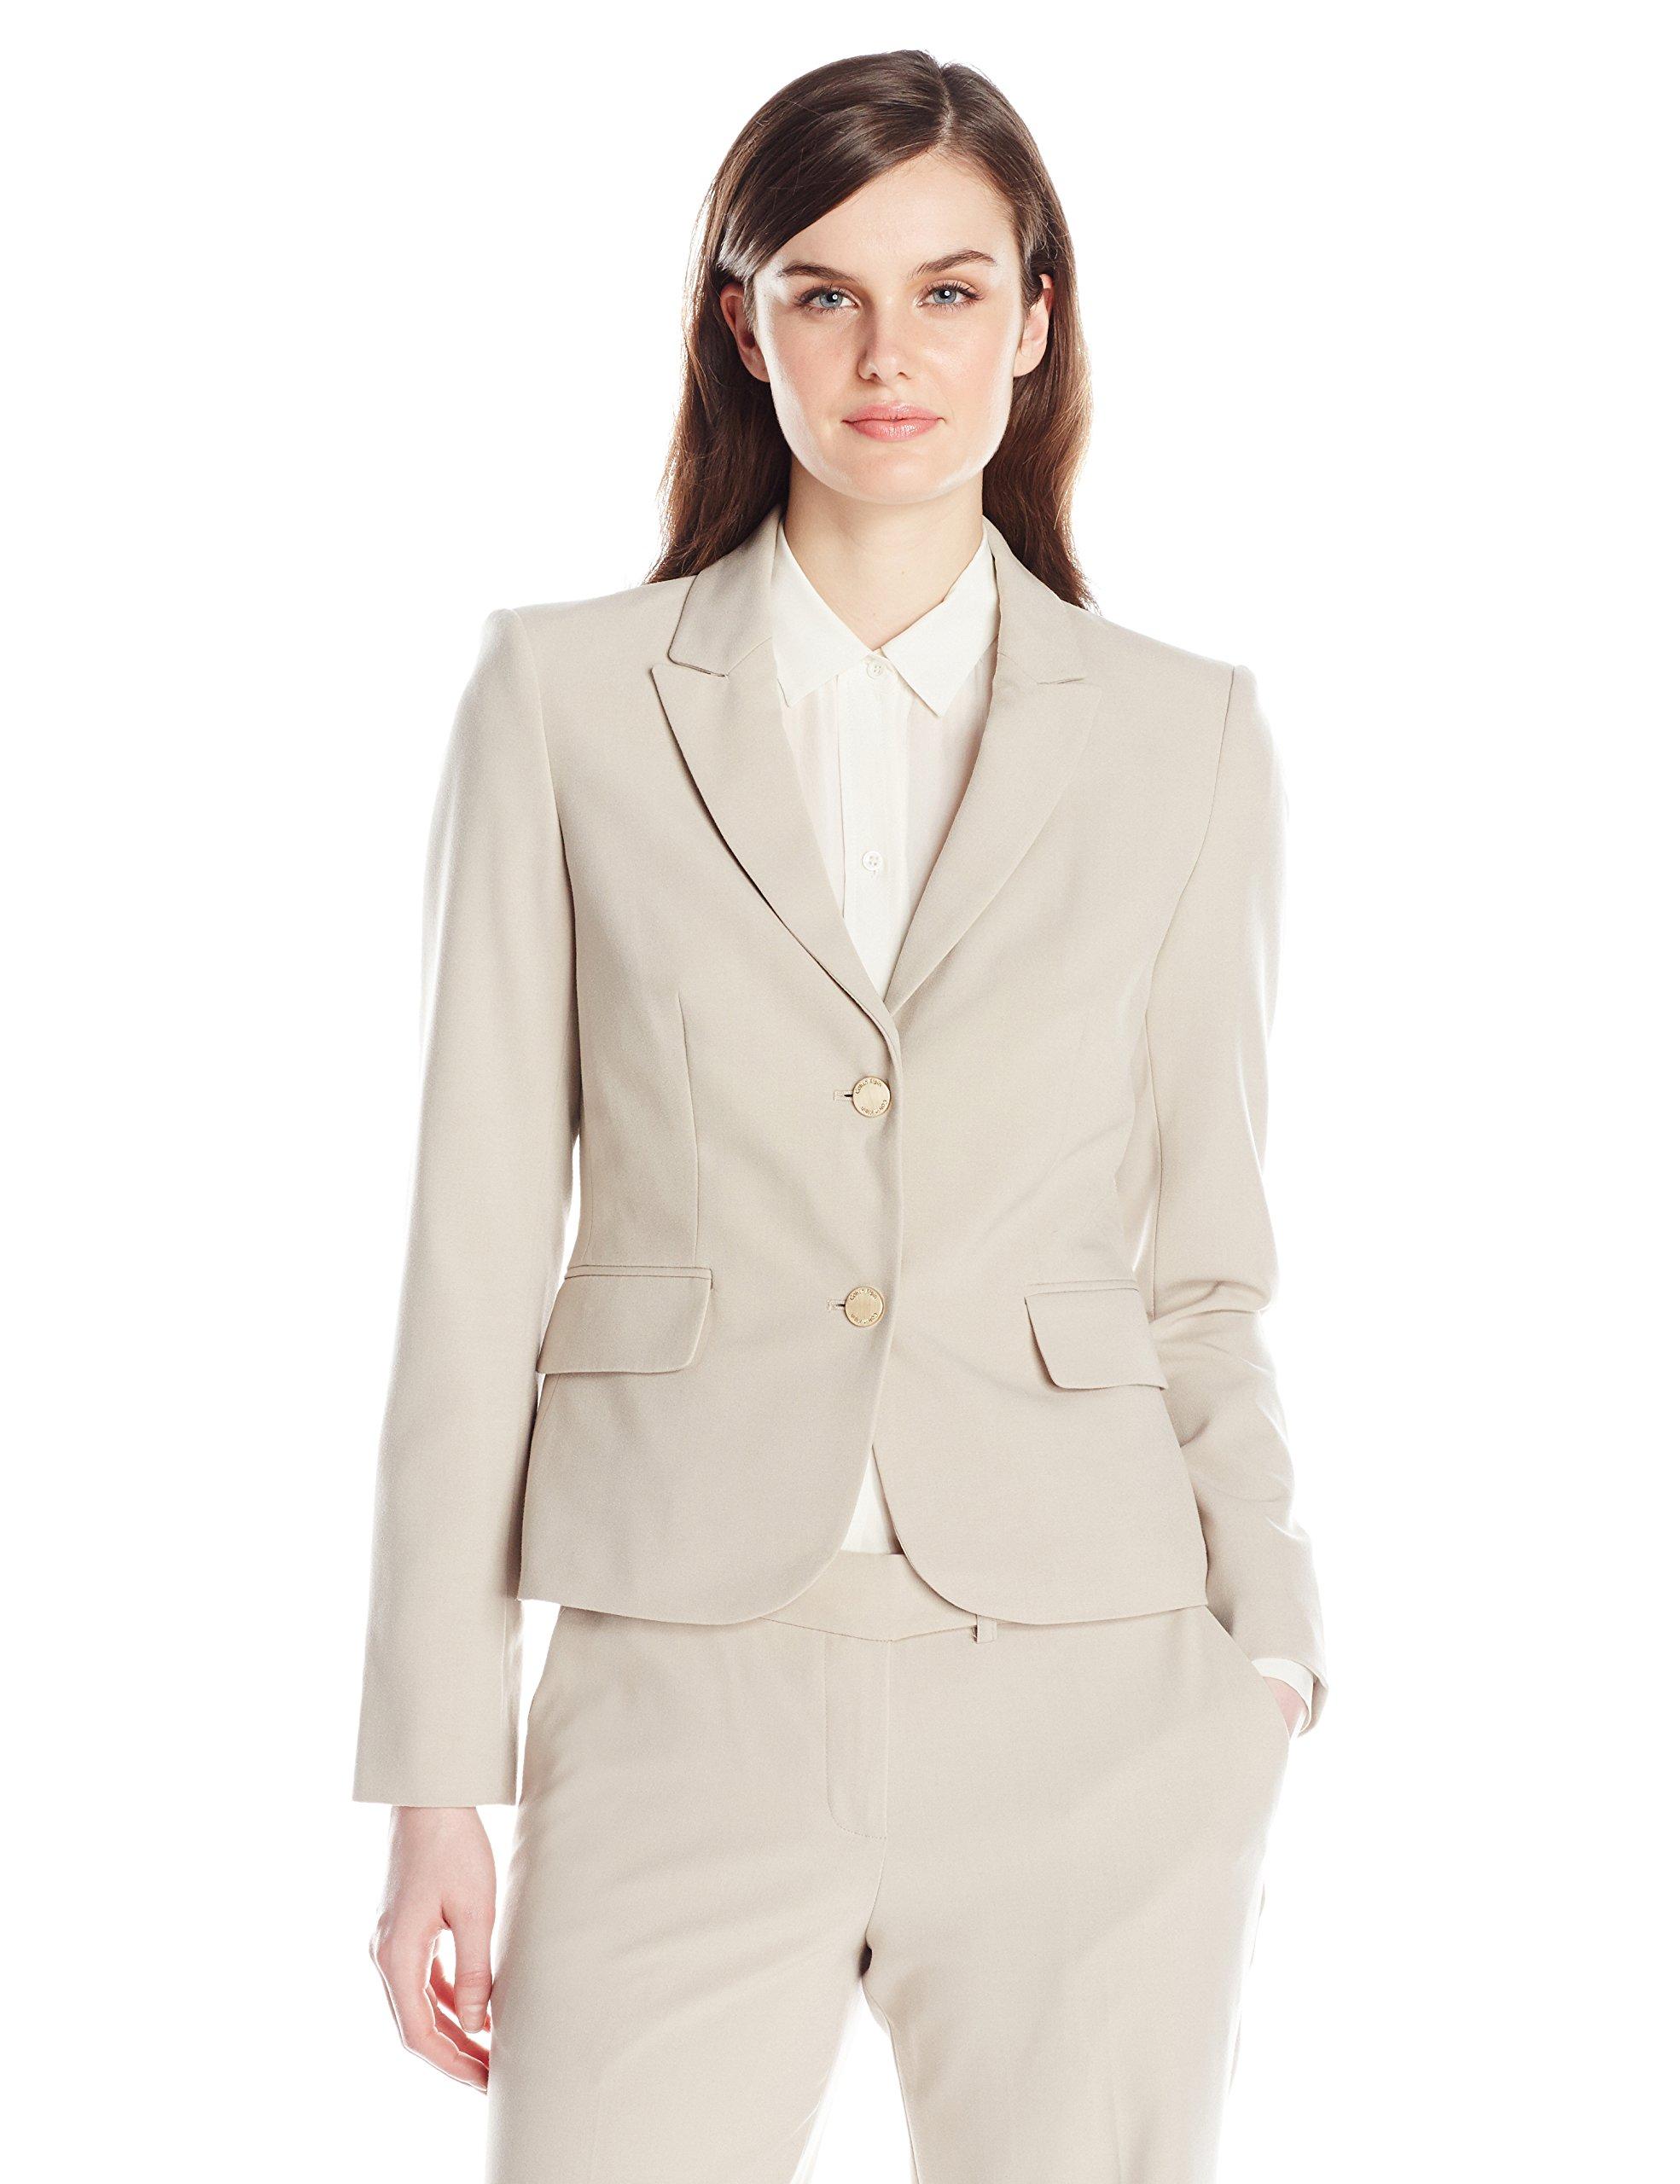 Calvin Klein Women's 2 Button Suit Jacket, Khaki, 6